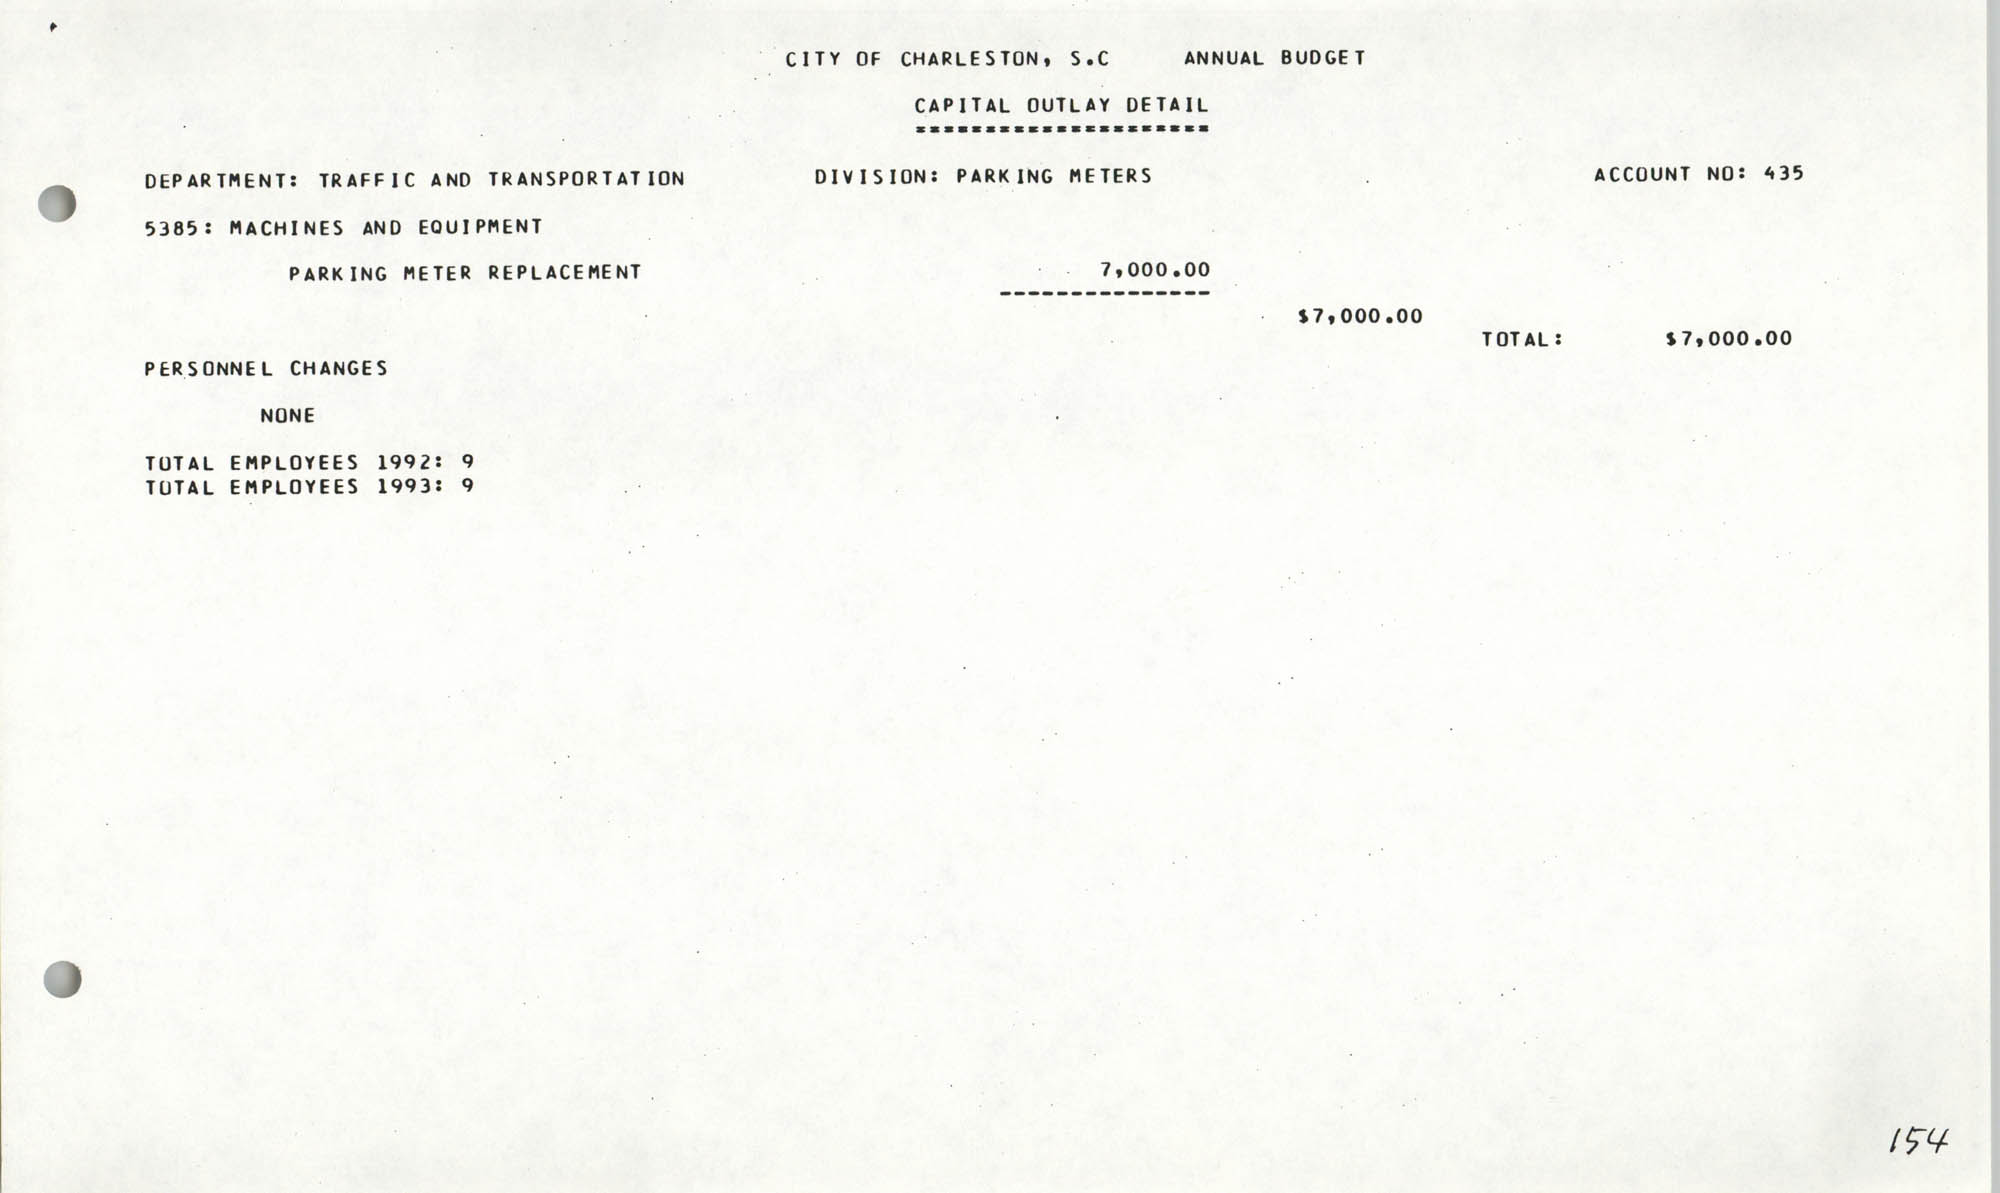 The City Council of Charleston, South Carolina, 1993 Budget, Page 154